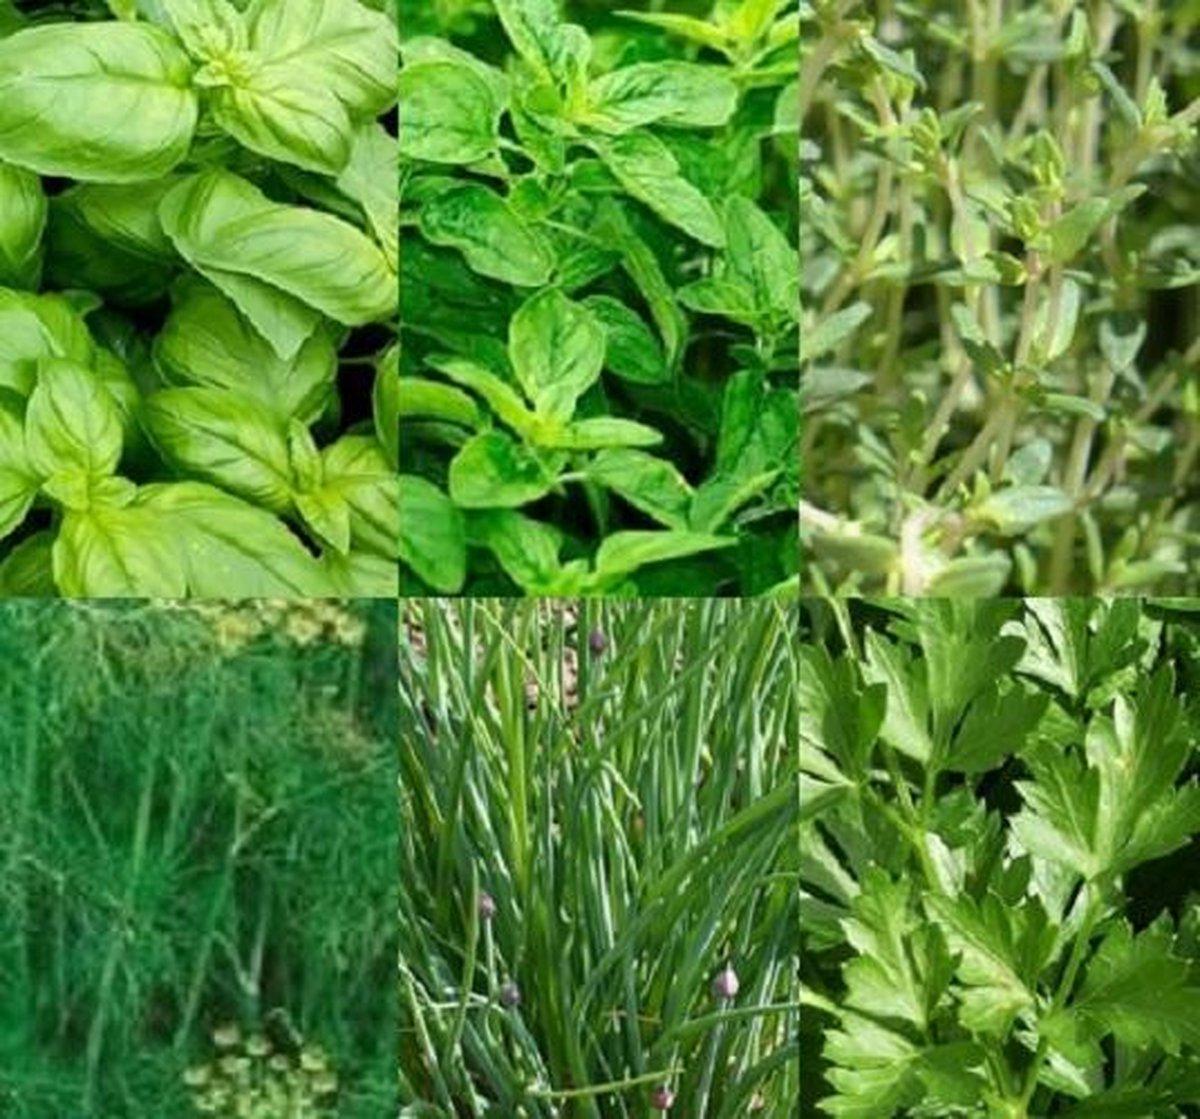 Kruiden zaden assortiment zaadlint (basilicum zaden, oregano zaden, tijm zaden, dille zaden, biesloo